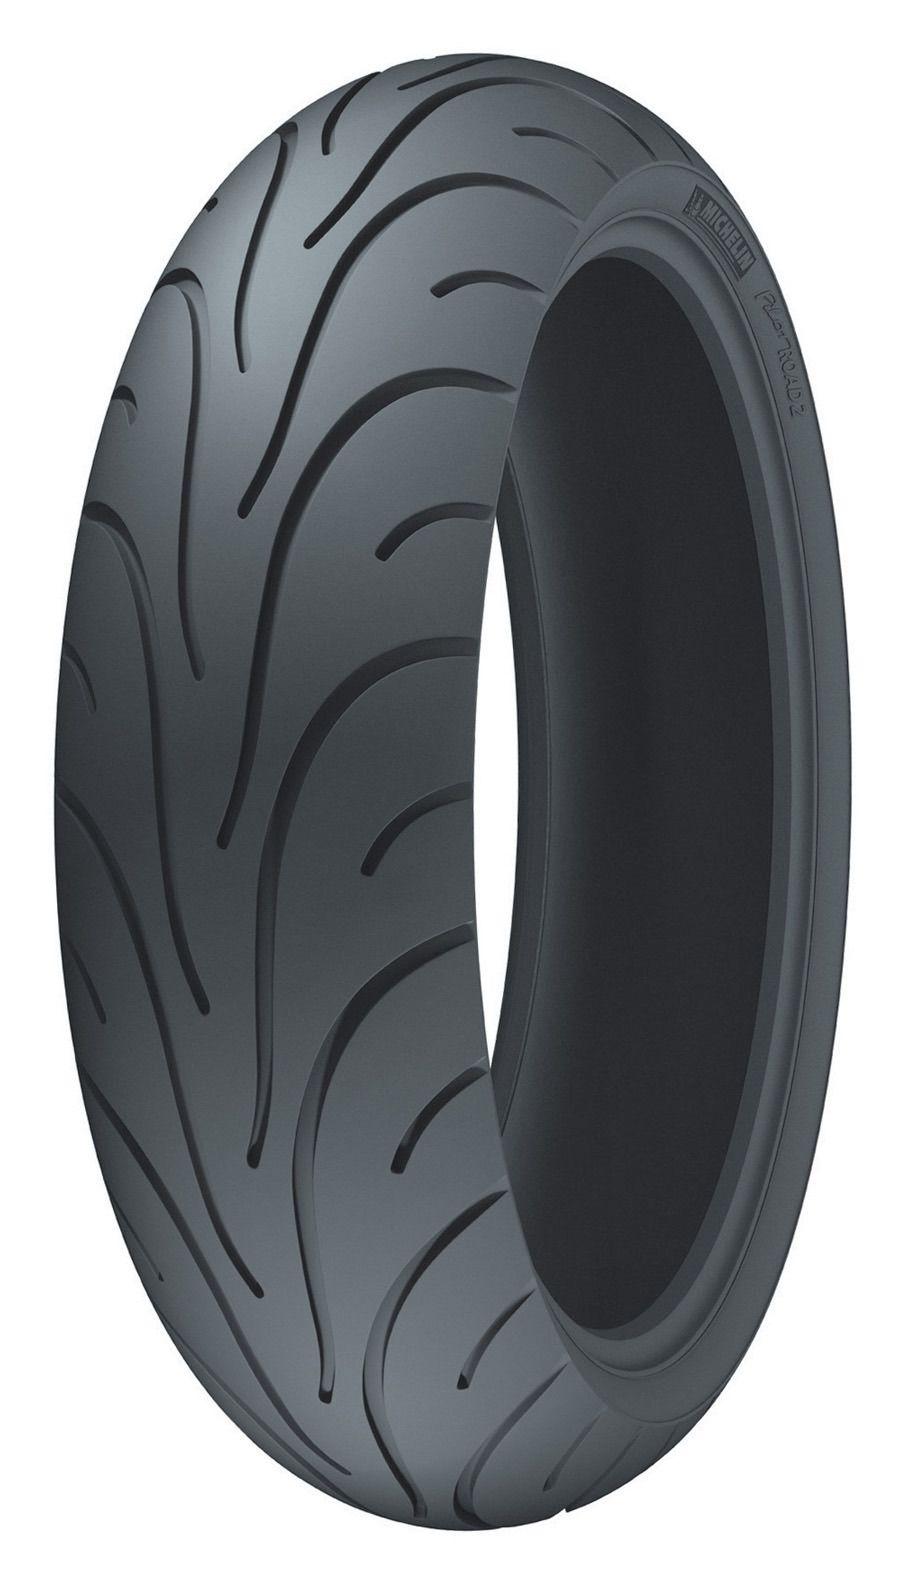 michelin pilot road 2 rear tires revzilla. Black Bedroom Furniture Sets. Home Design Ideas